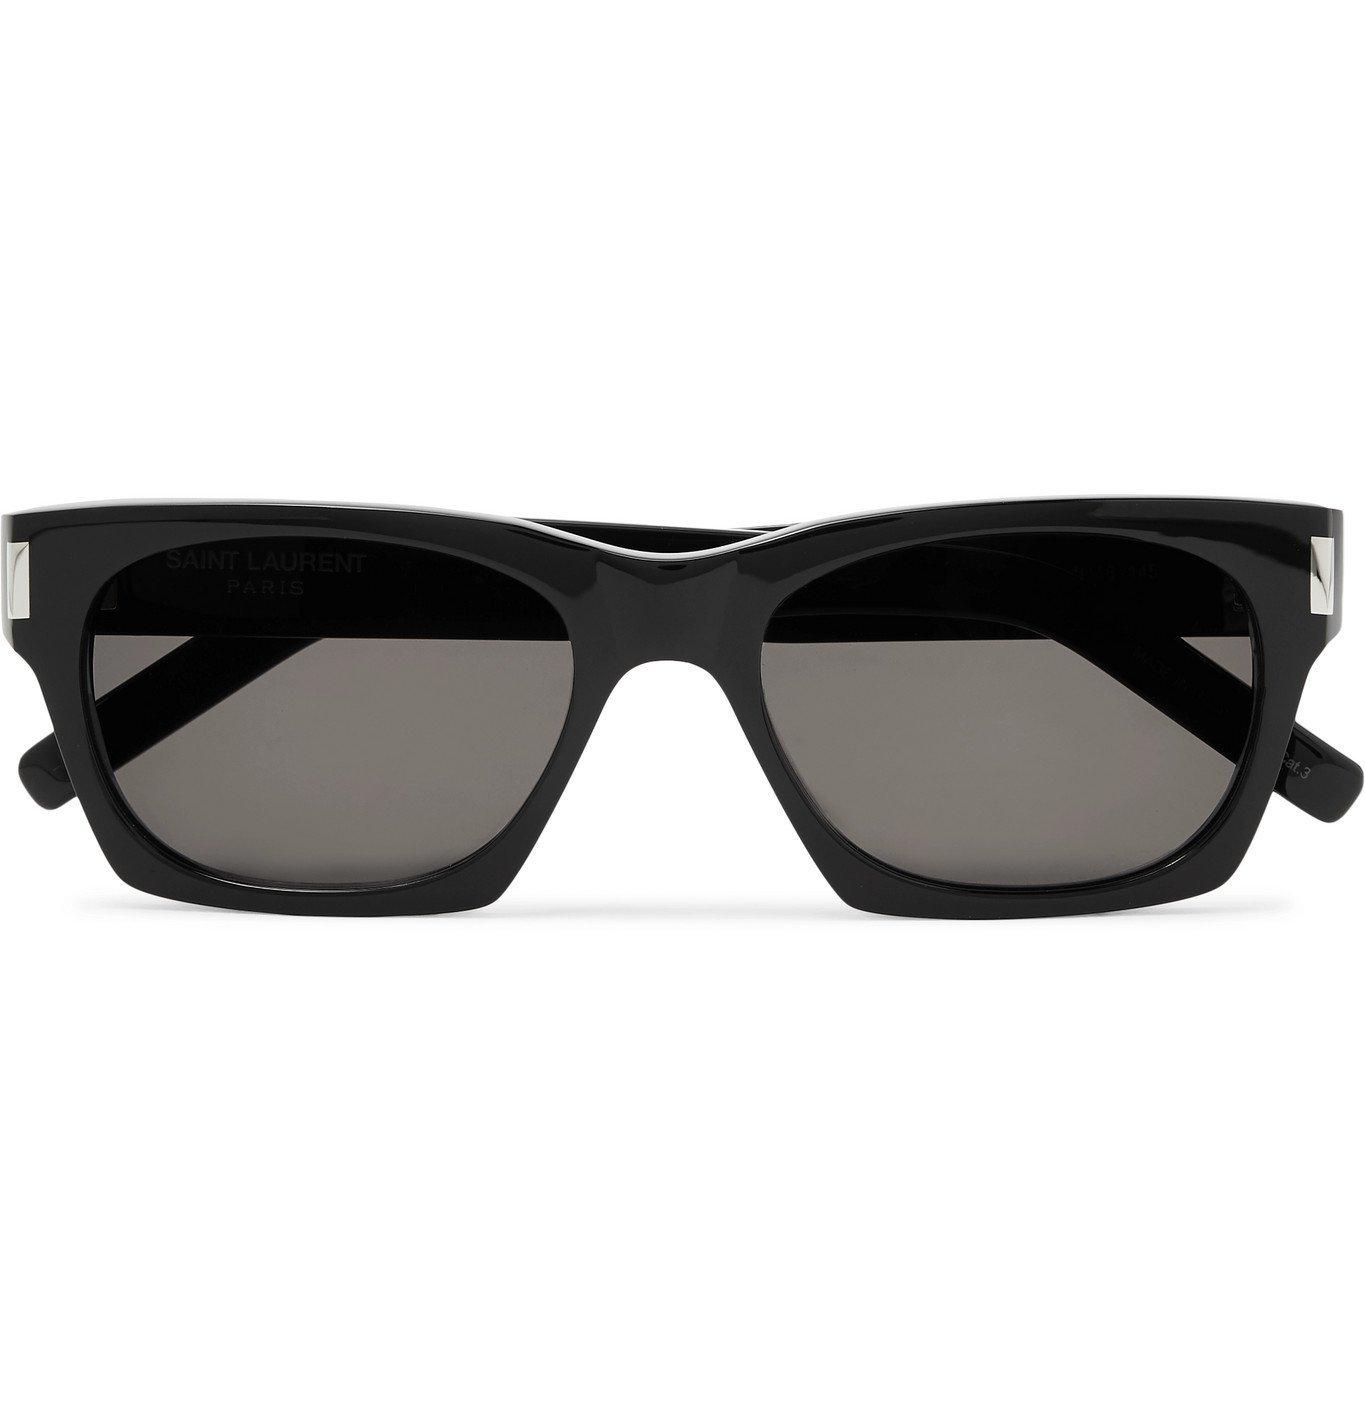 SAINT LAURENT - Square-Frame Acetate and Silver-Tone Sunglasses - Black